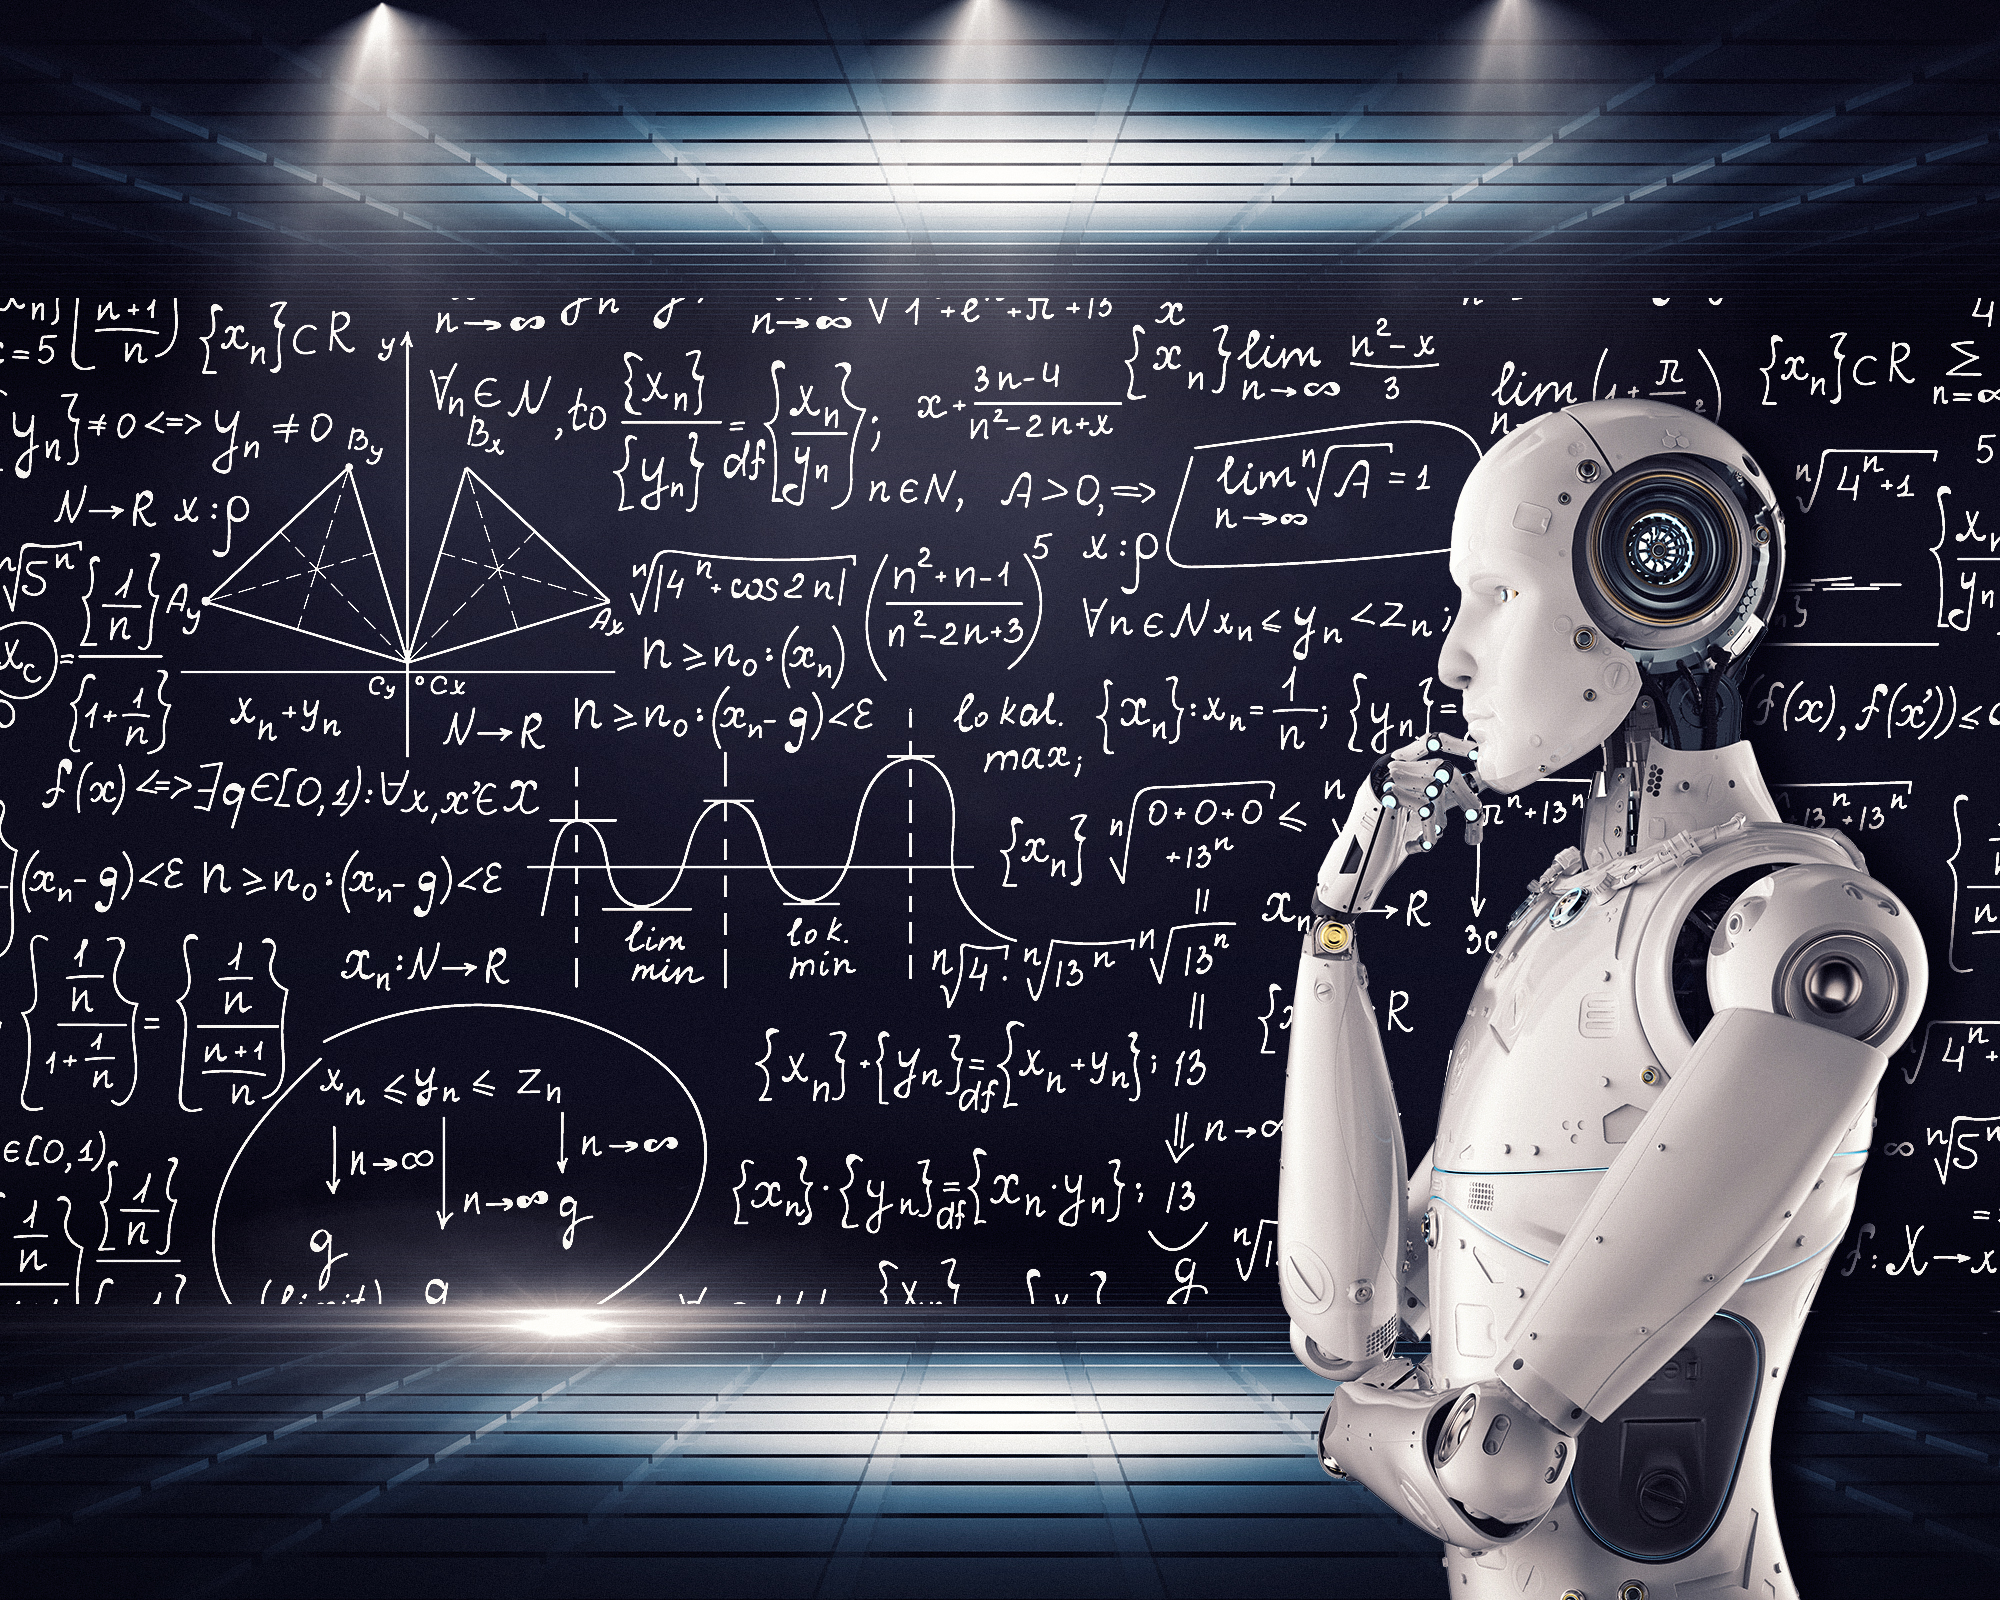 File:Artificial Intelligence & AI & Machine Learning - 30212411048.jpg -  Wikimedia Commons